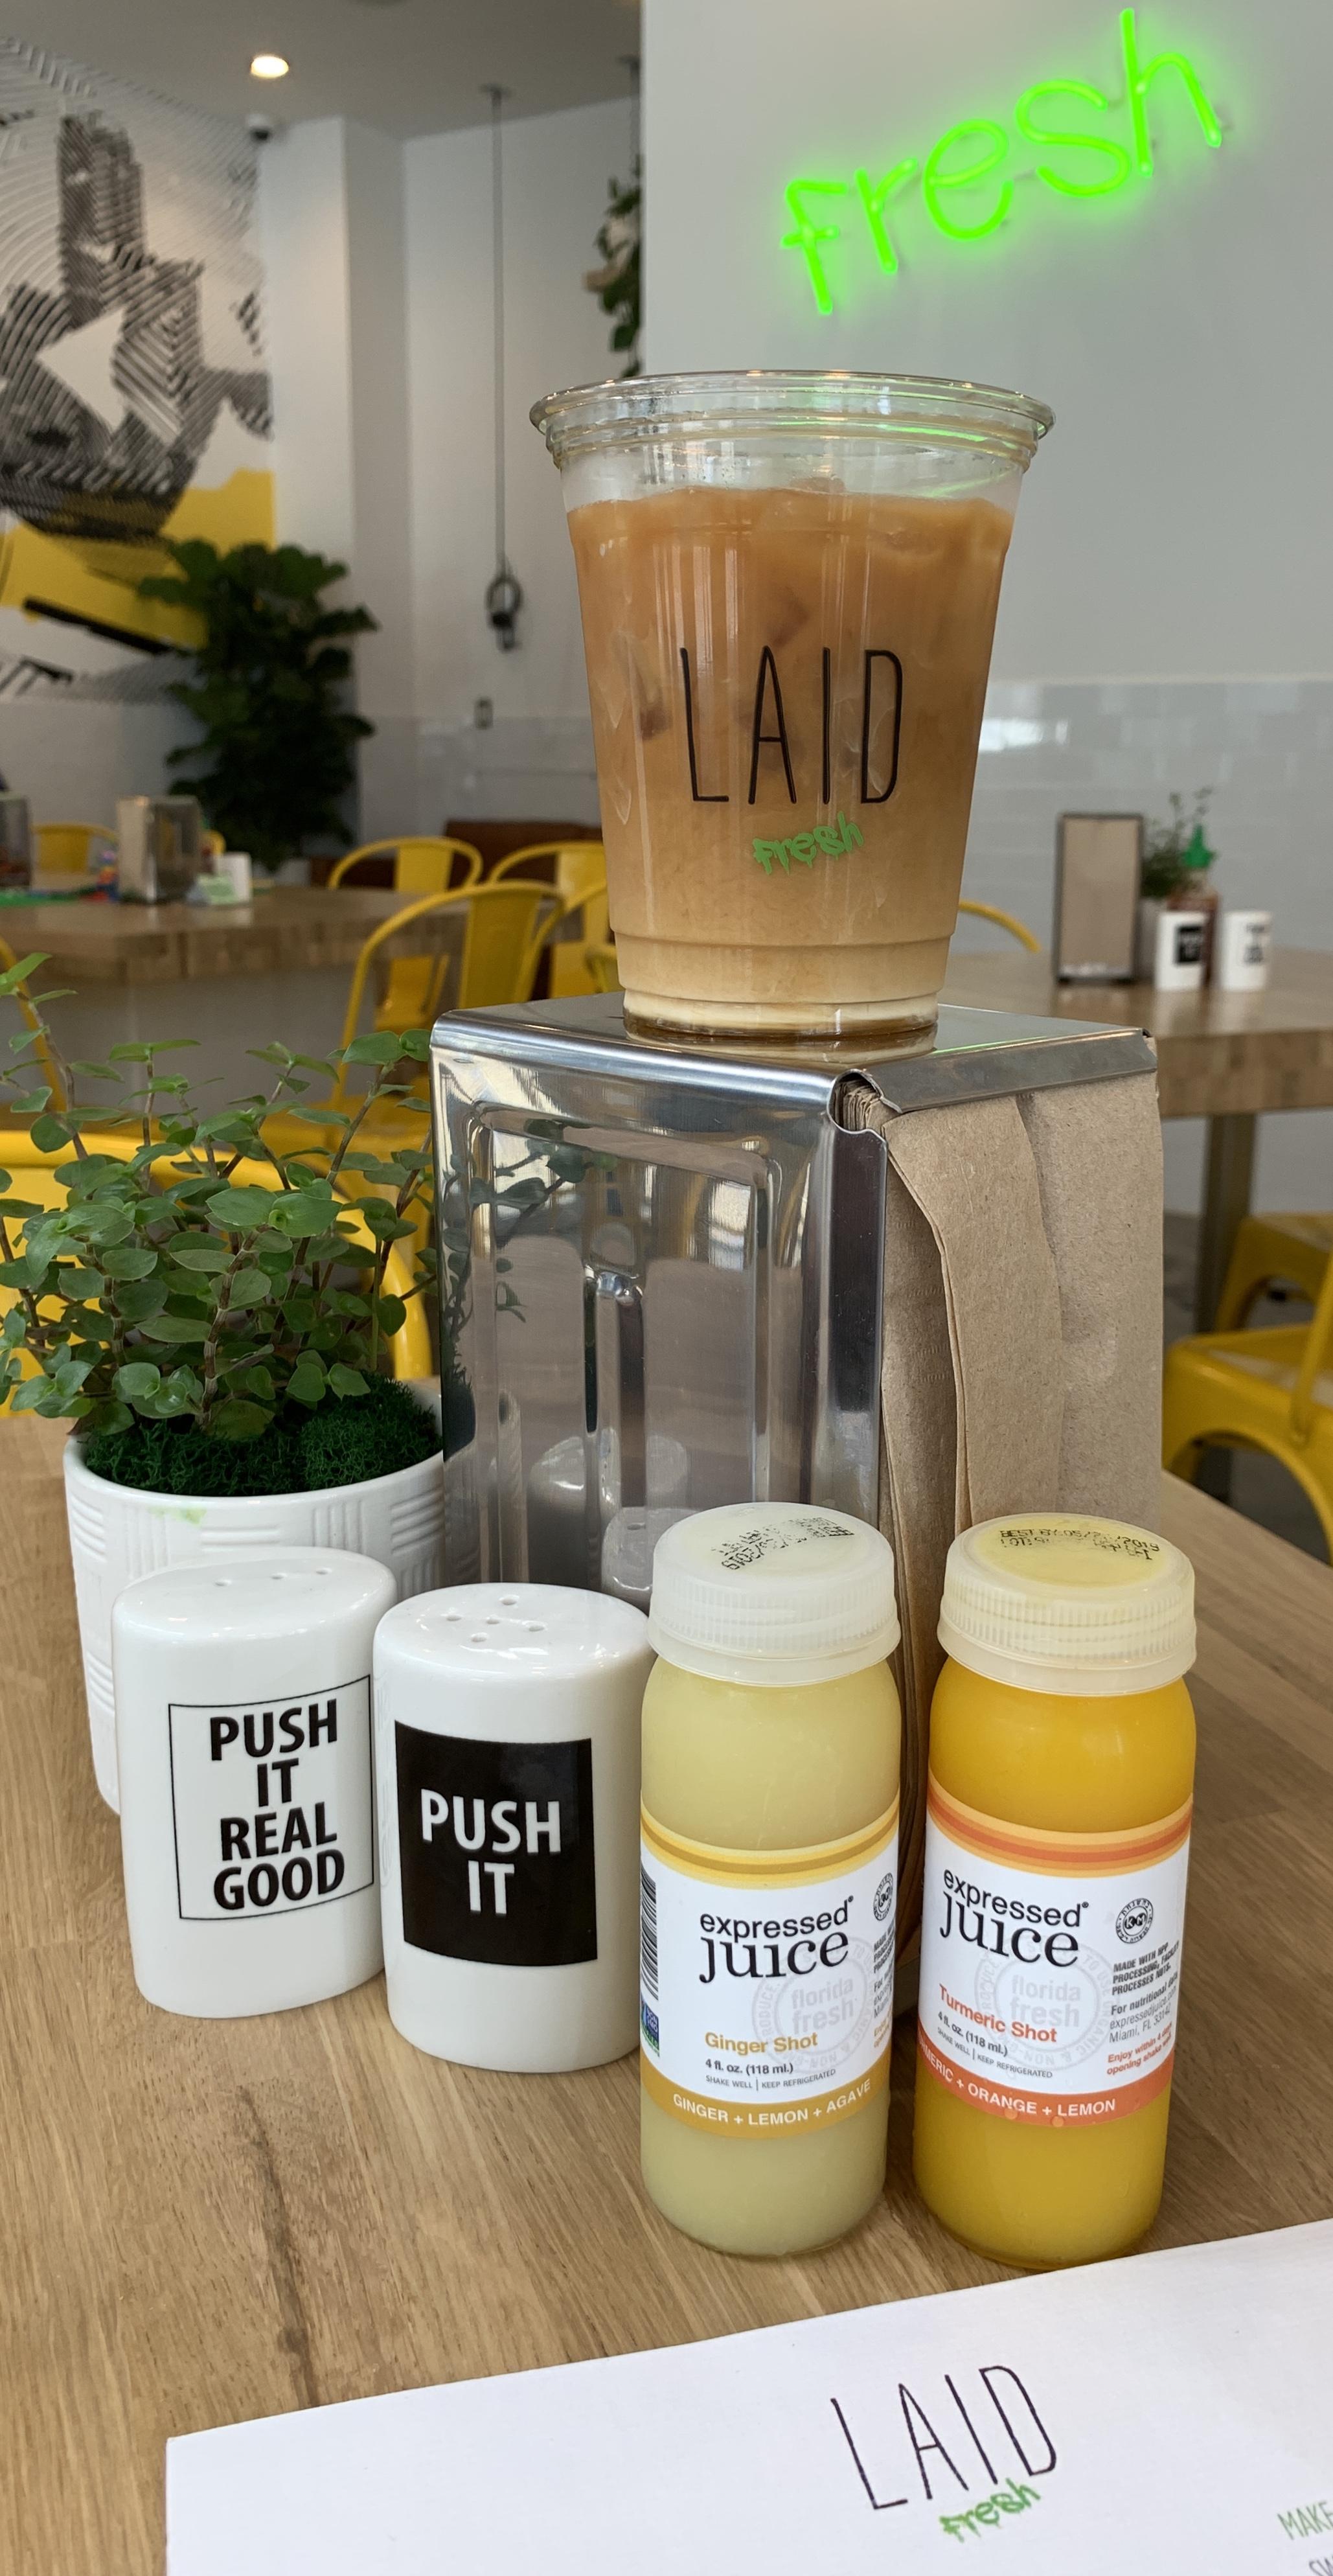 LAID Fresh Beverages